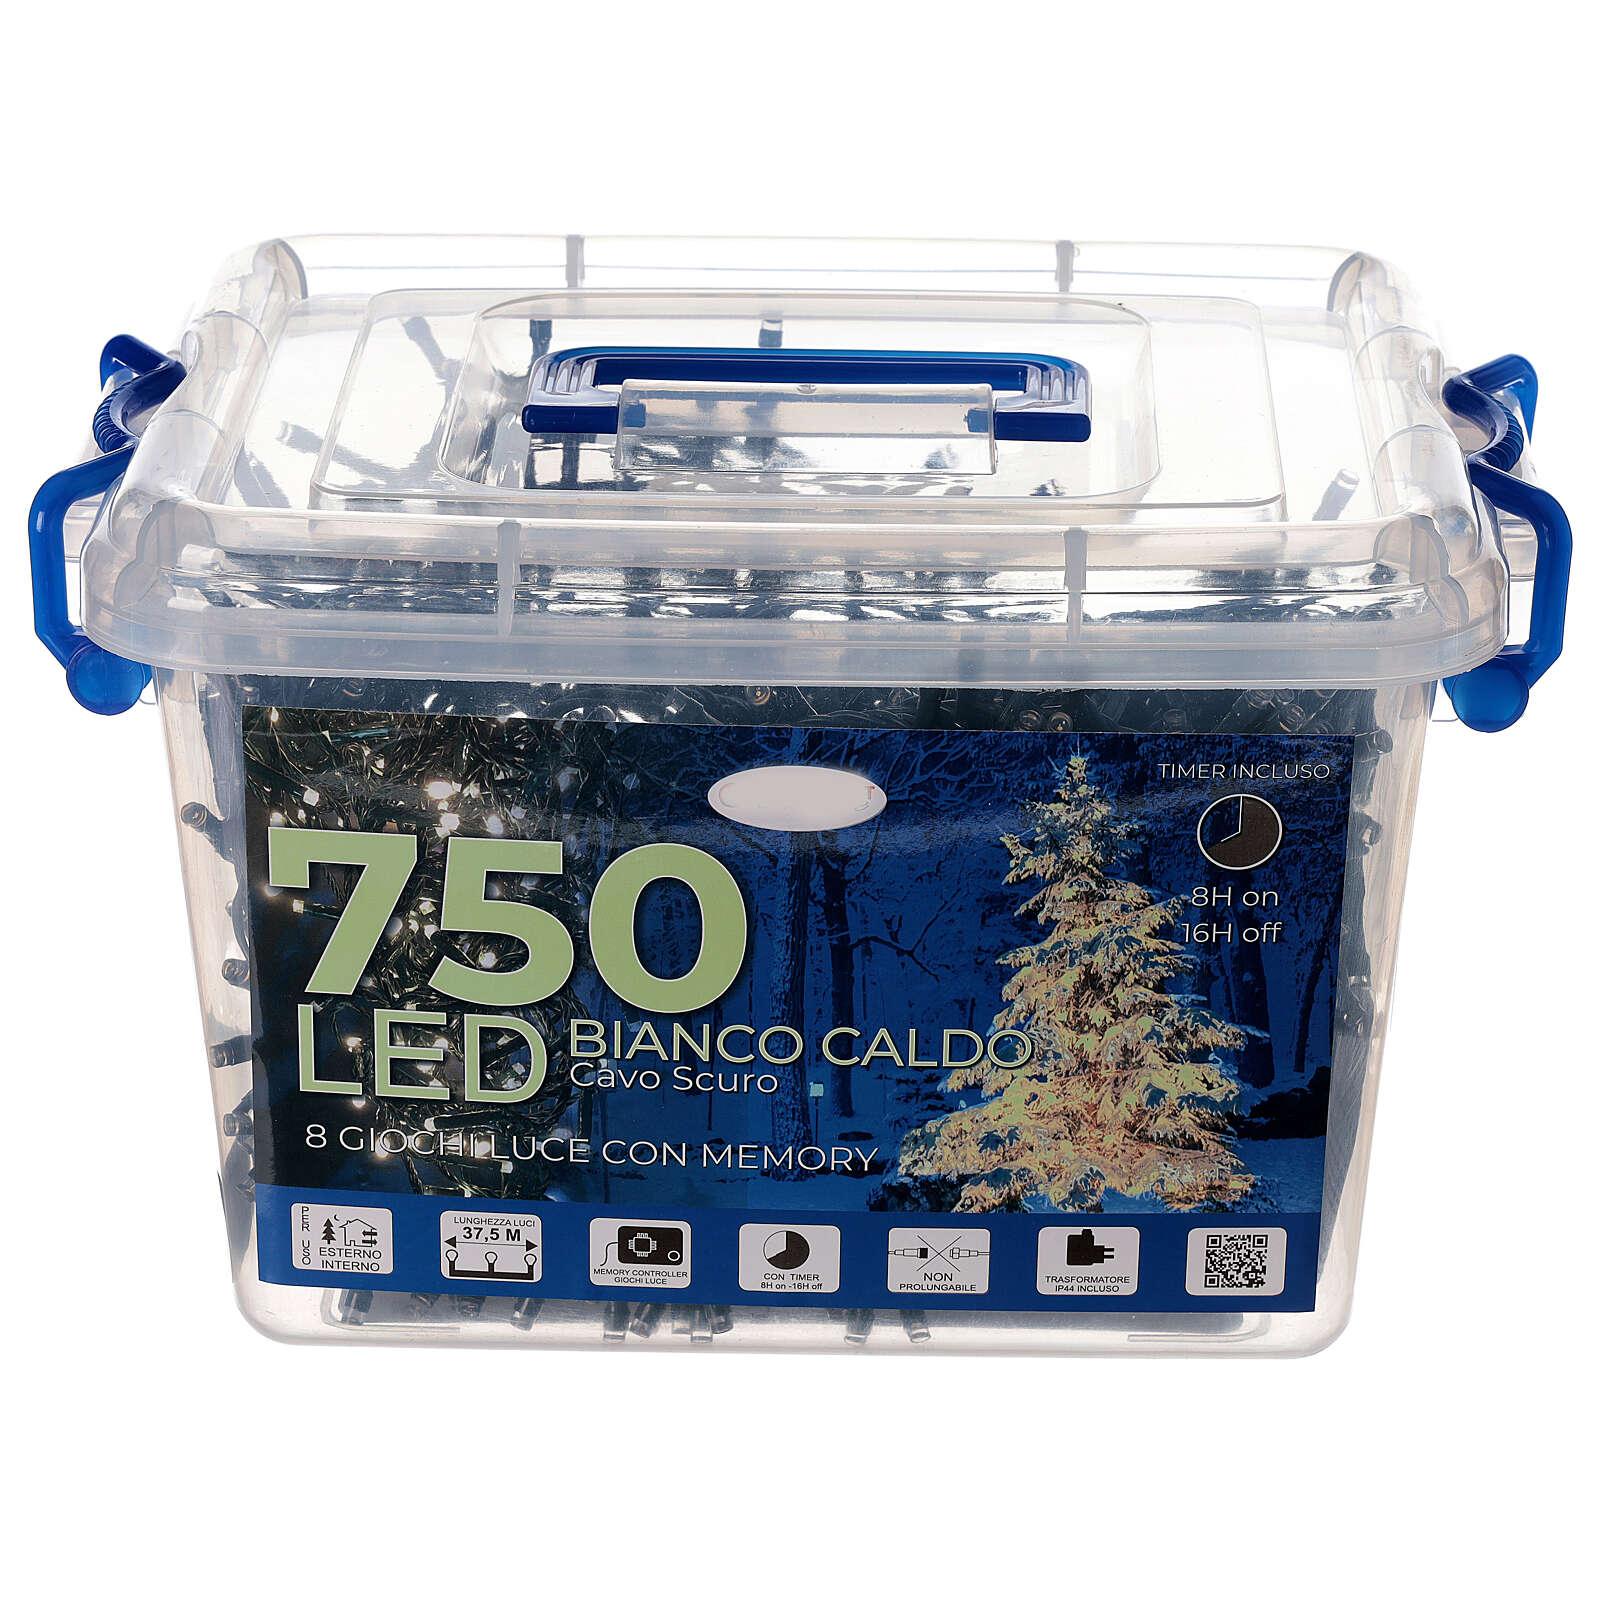 Cadena luces 750 led blanco cálido juegoz luz interior exterior 37,5 m 3